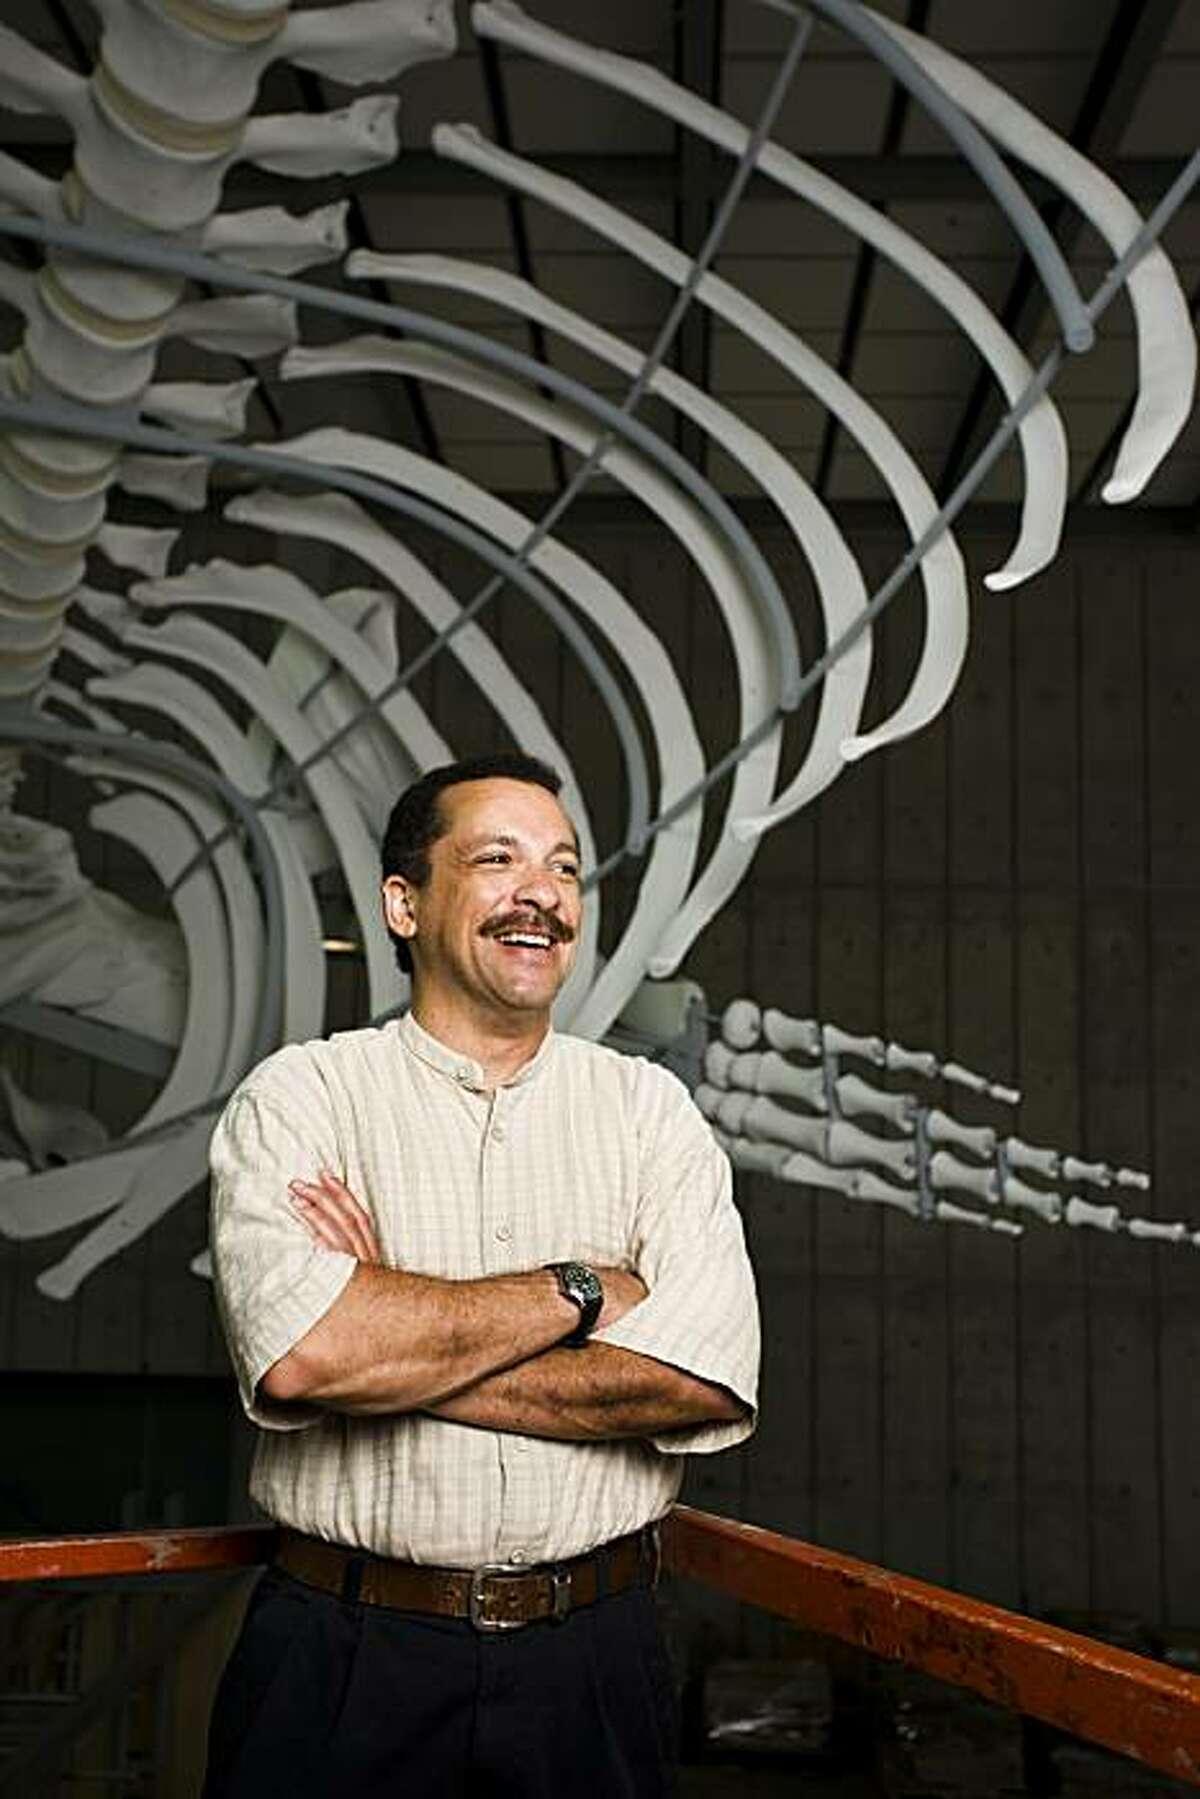 Peter Roopnarine, scientist at California Academy of Sciences